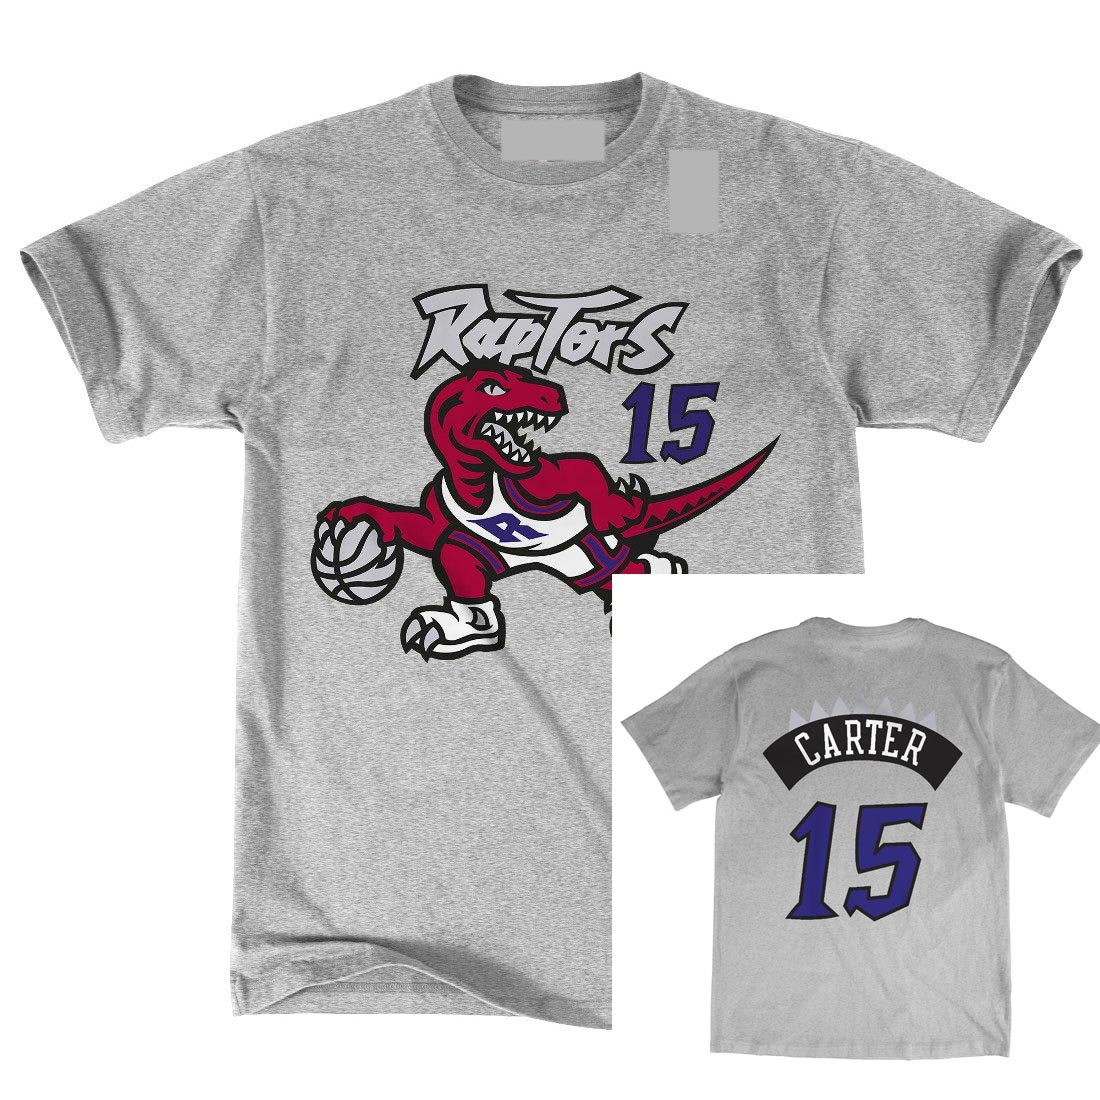 Toronto T Shirt Raptors Carter Hwc Retro Name and Number T-shirt 2018 New 100% Cotton Top Quality Top Tee Plus Size Harajuku